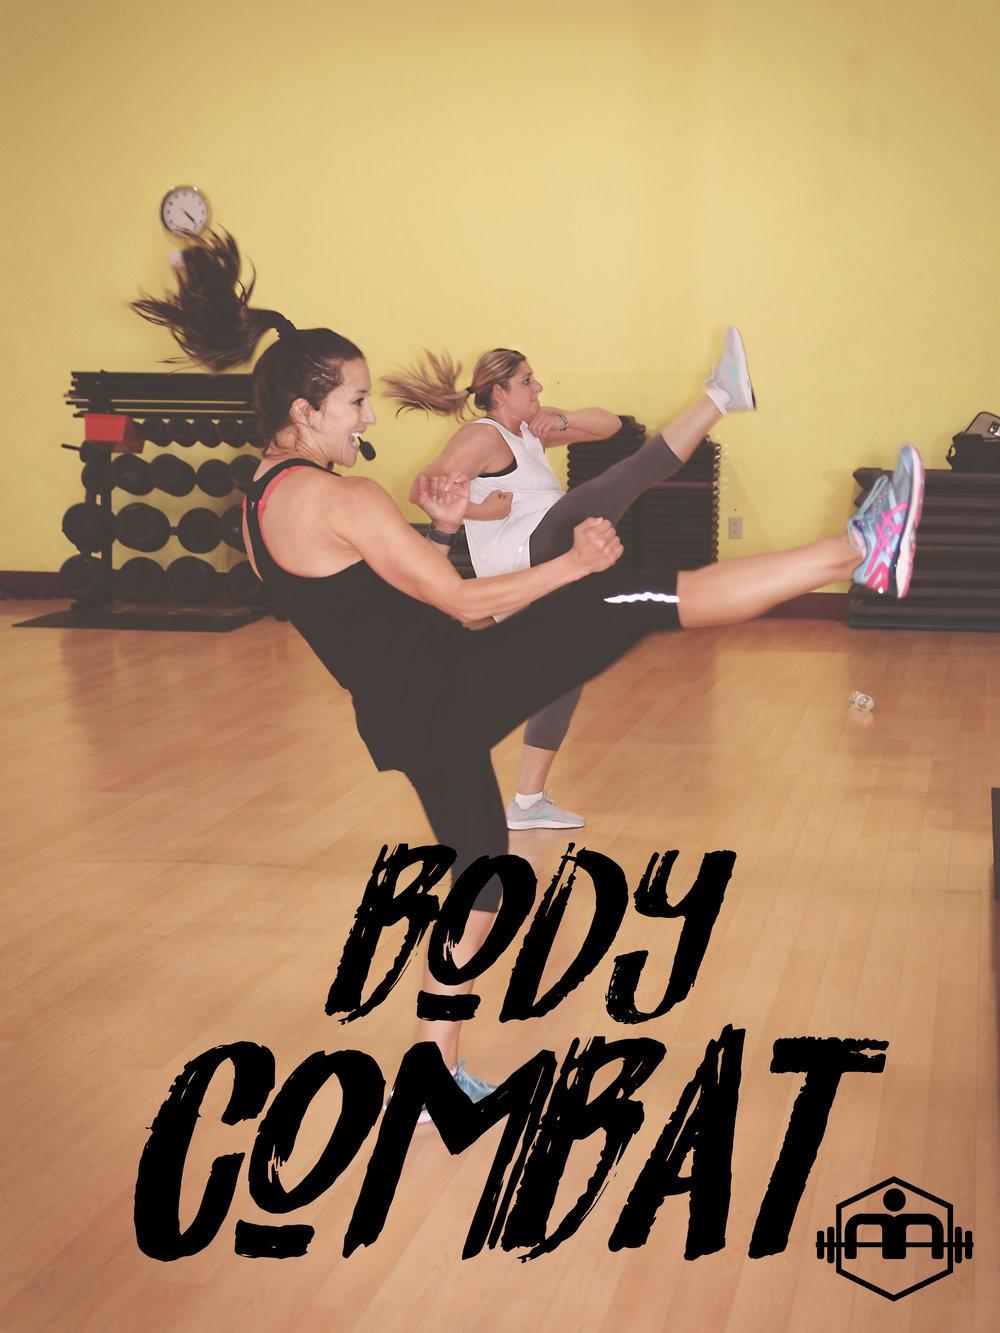 Body Combat 3cover.jpg